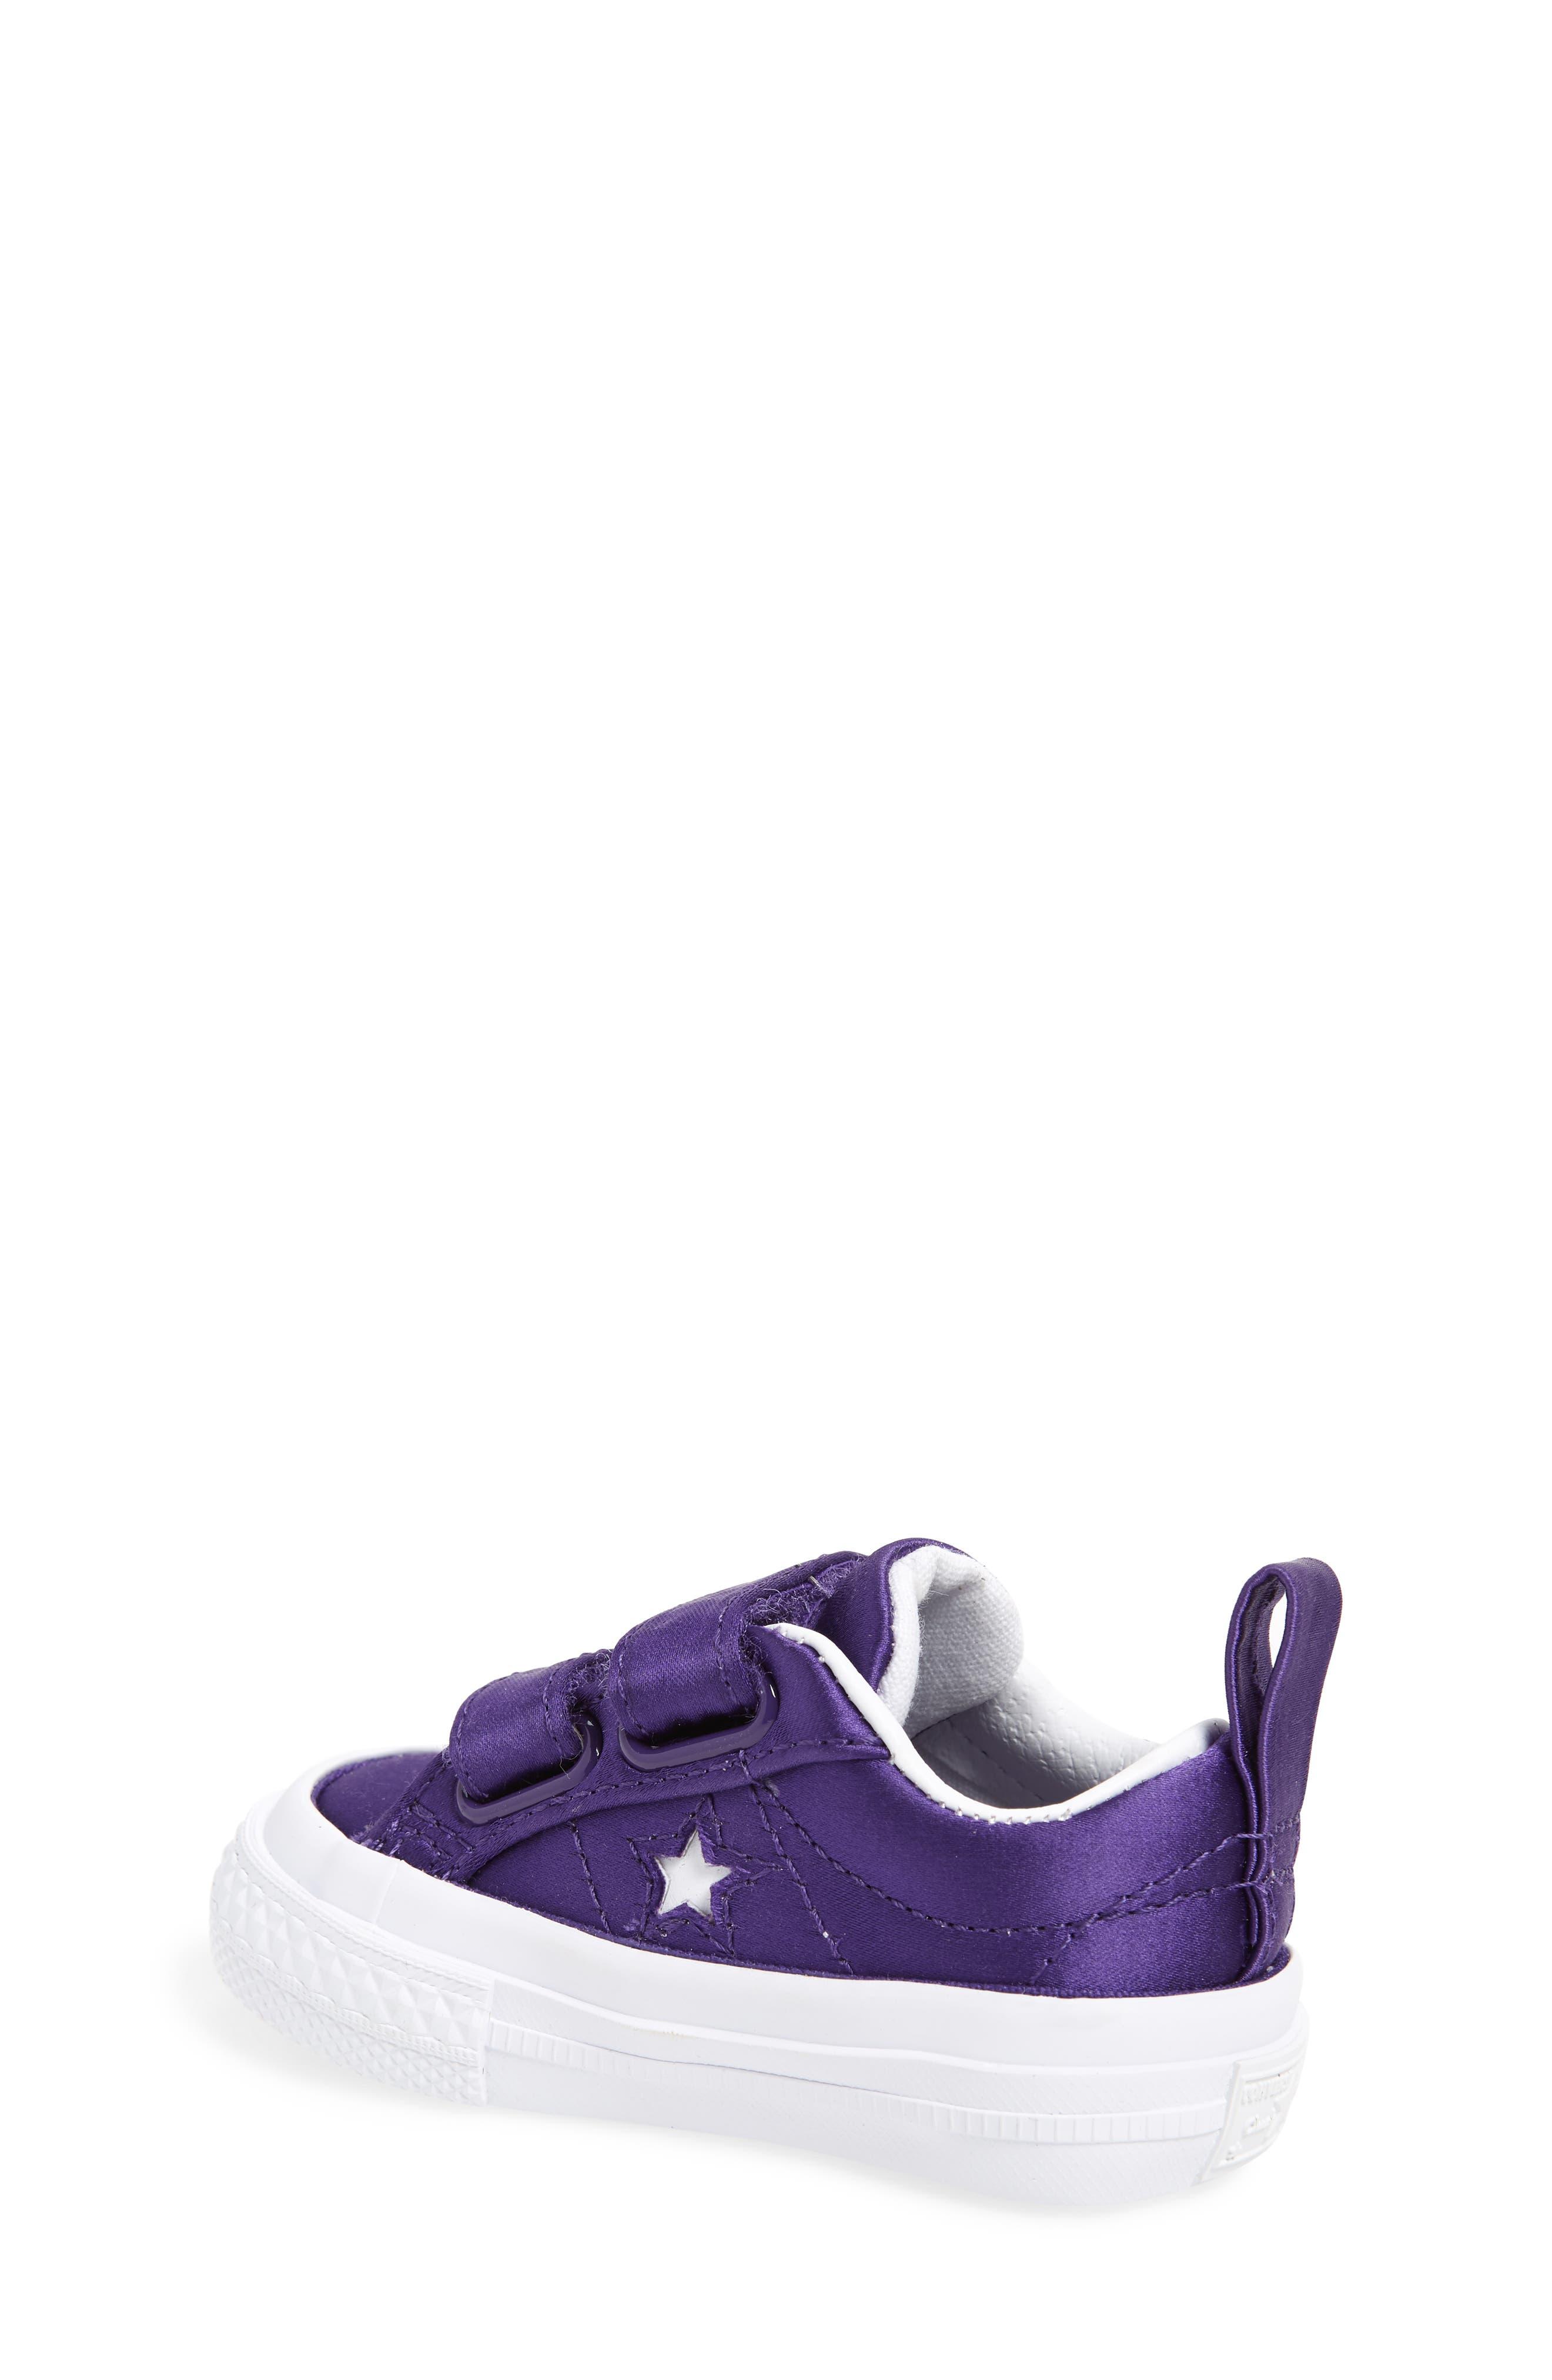 One Star Satin 2V Low Top Sneaker,                             Alternate thumbnail 2, color,                             Court Purple